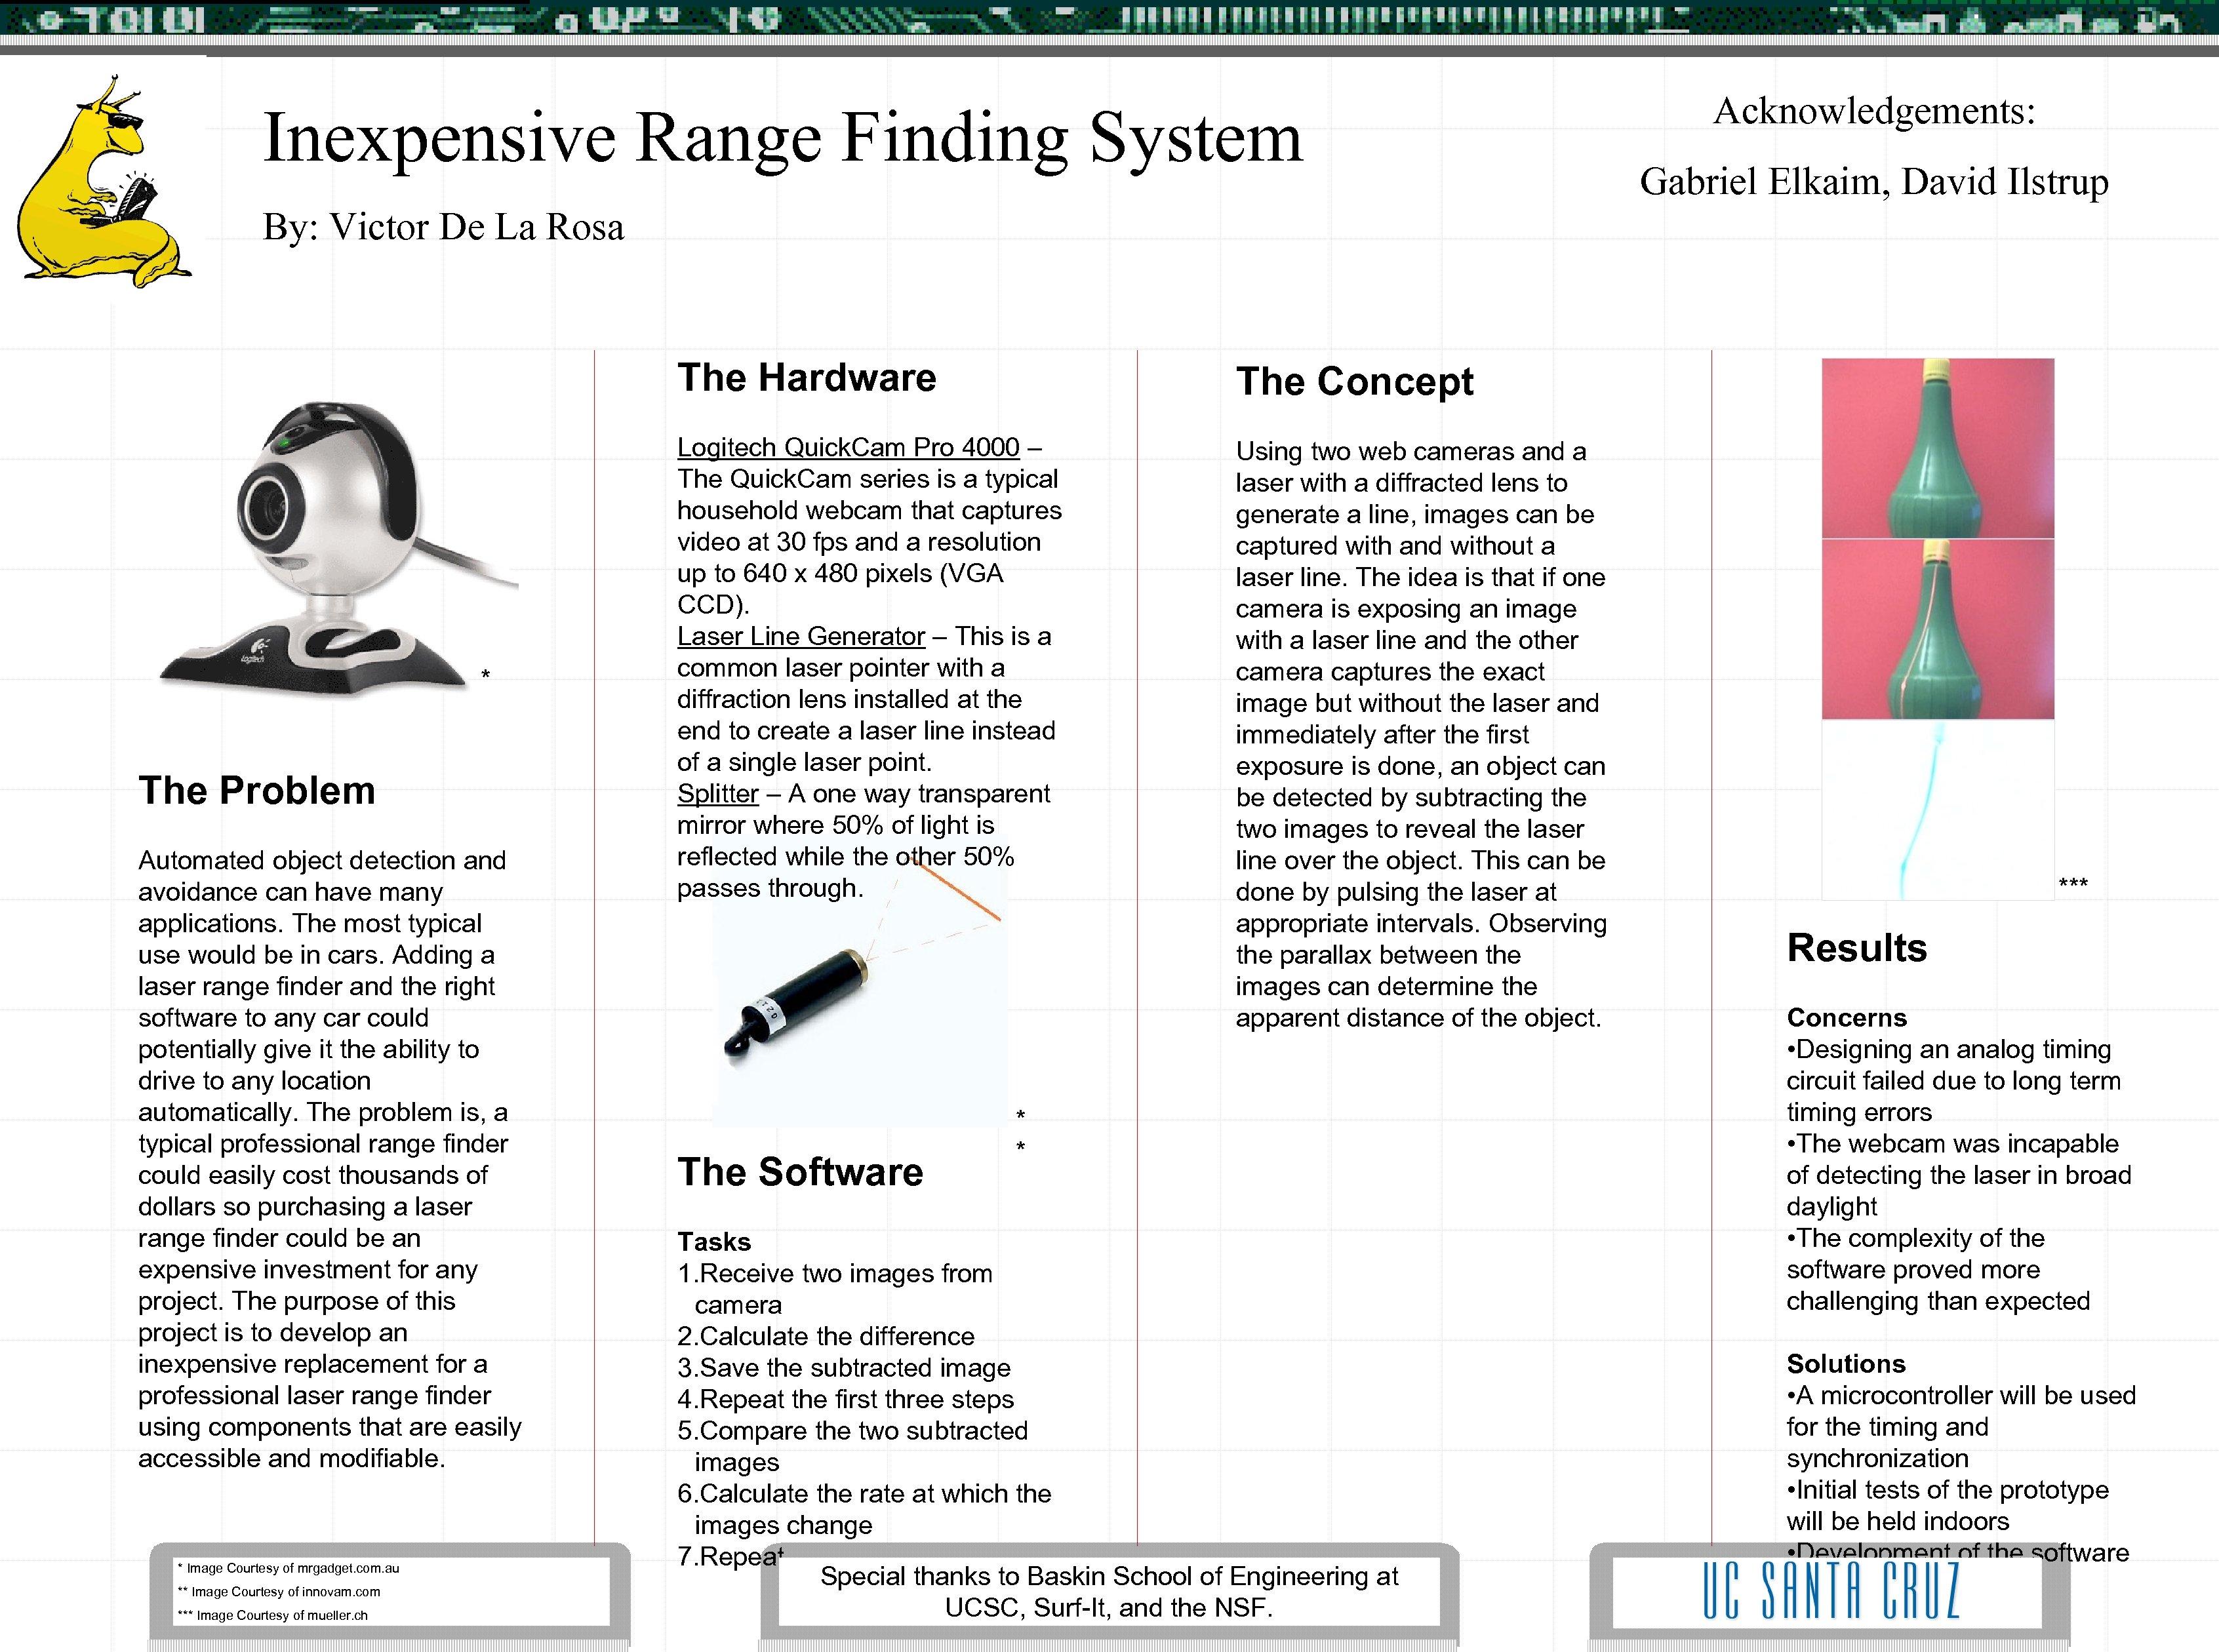 Inexpensive Range Finding System Acknowledgements: Gabriel Elkaim, David Ilstrup By: Victor De La Rosa